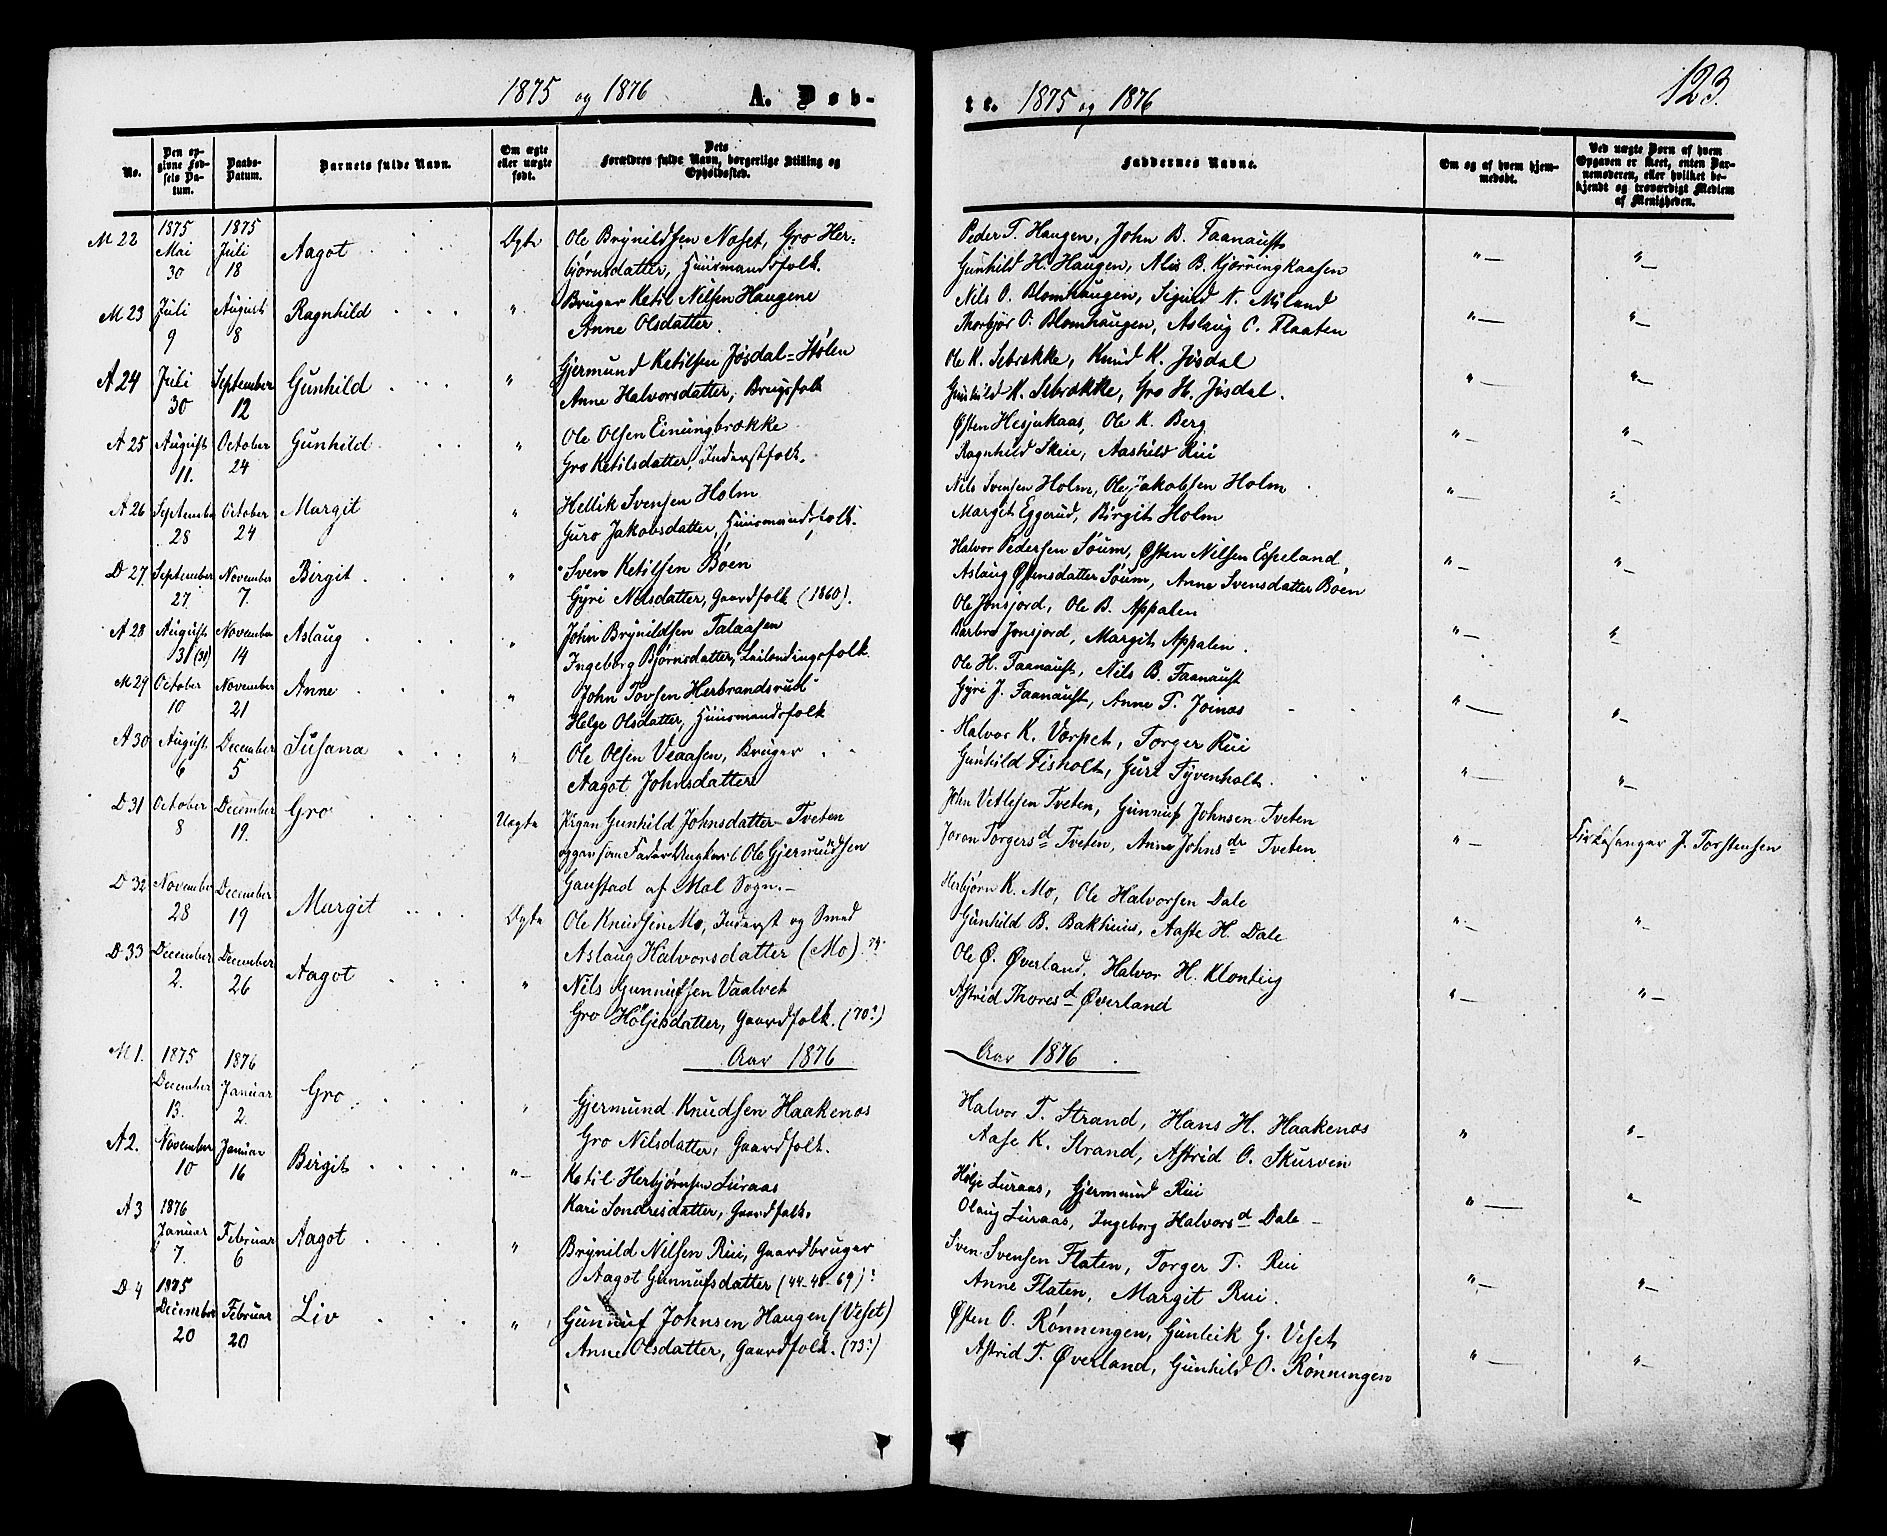 SAKO, Tinn kirkebøker, F/Fa/L0006: Ministerialbok nr. I 6, 1857-1878, s. 123